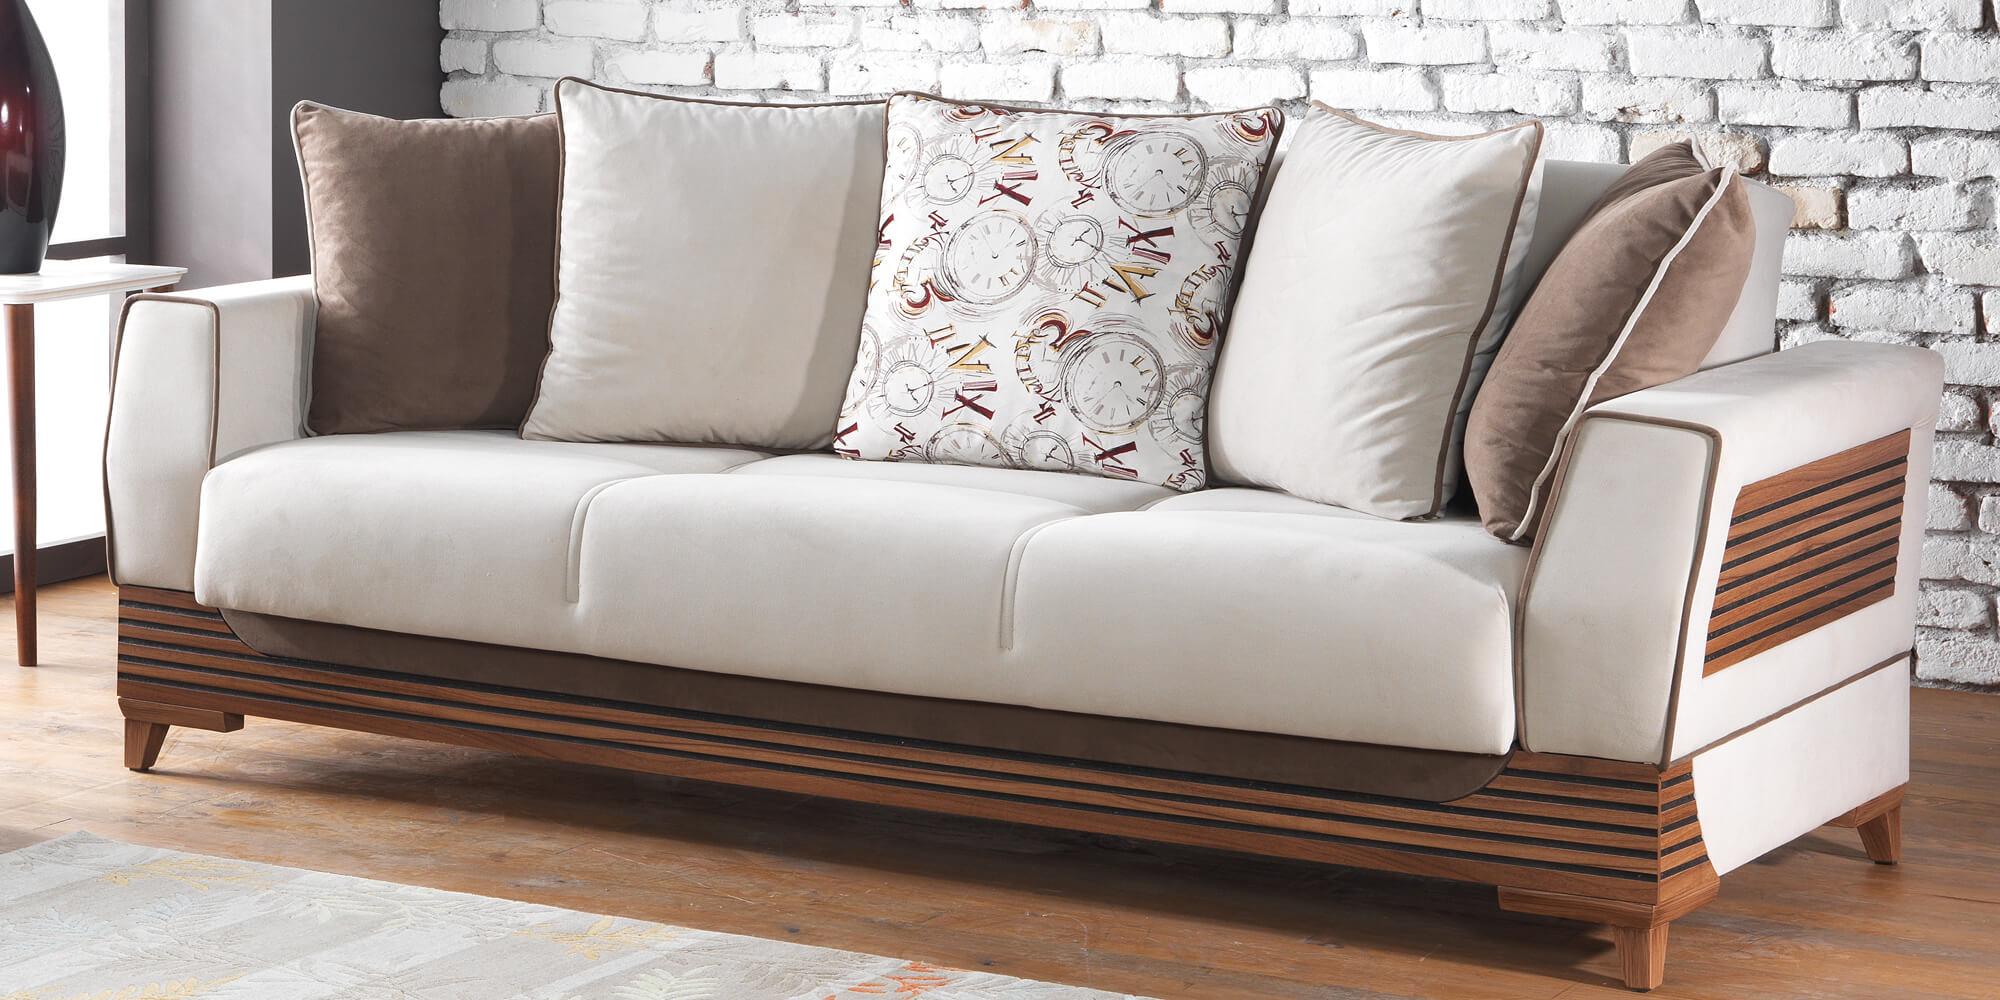 piramit 3 2 1 delux sofa set yuvam m belhaus in wuppertal cilek offizieller h ndler in europa. Black Bedroom Furniture Sets. Home Design Ideas